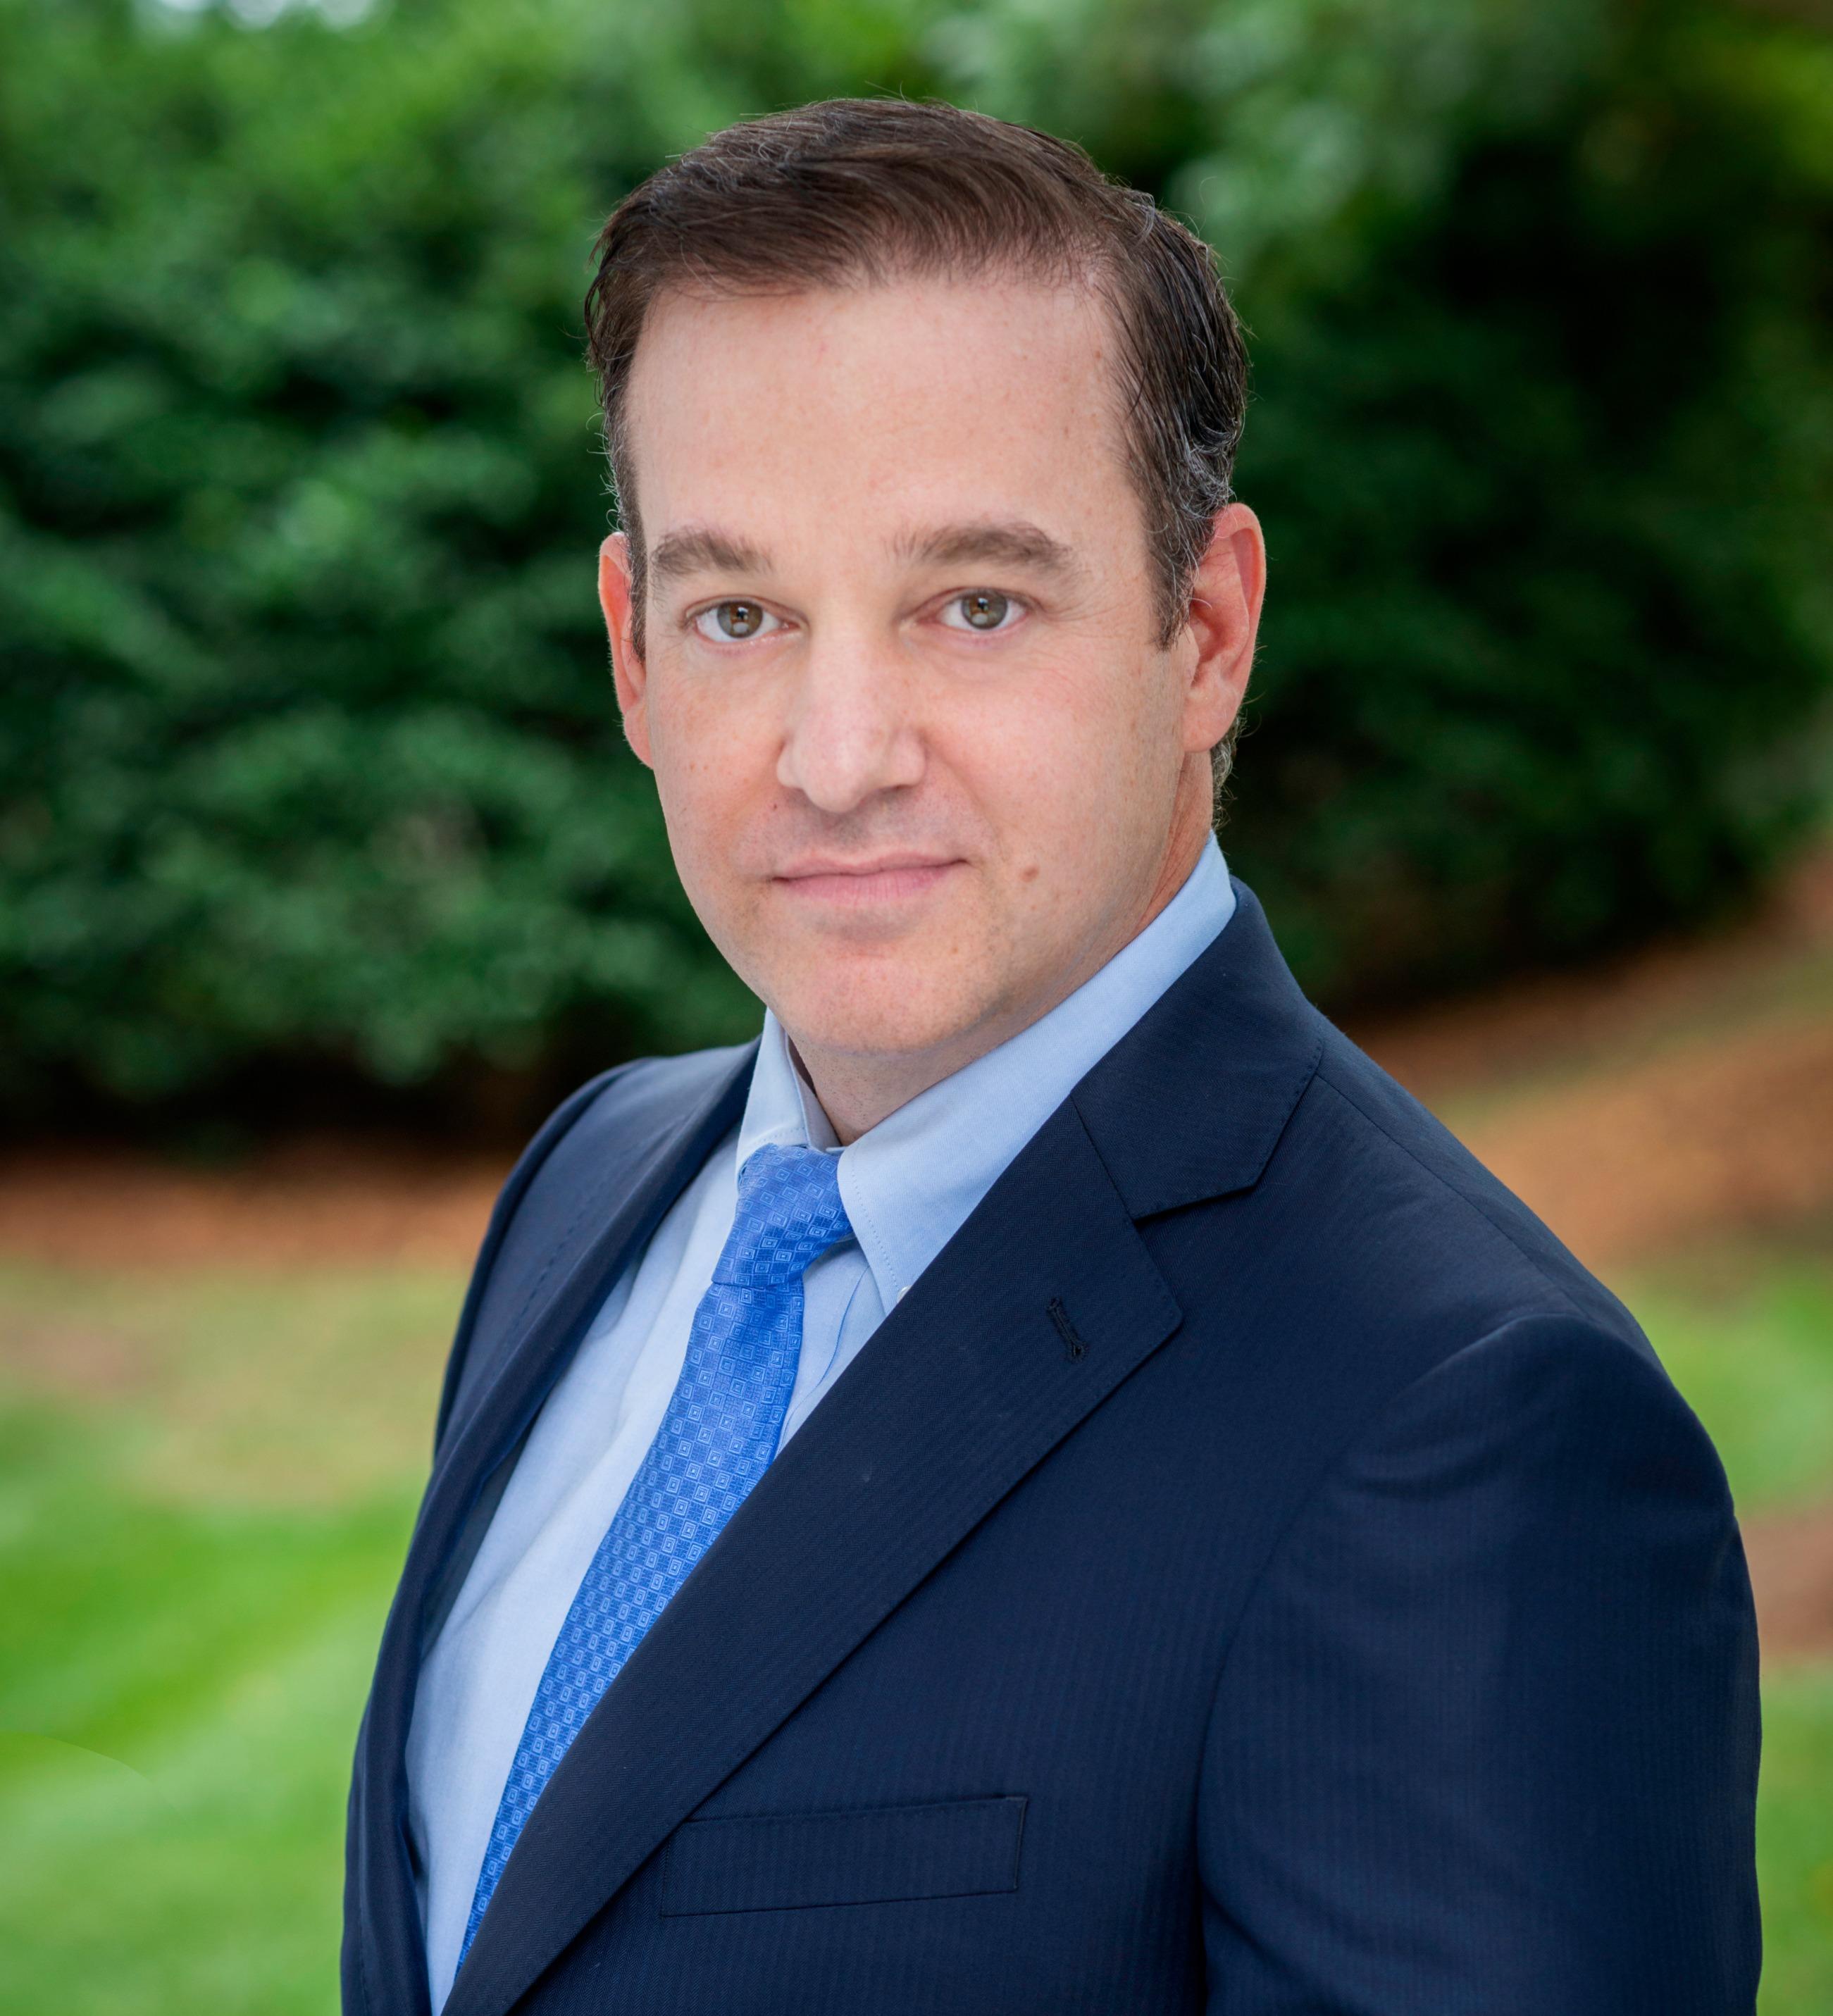 Michael Maurer's Profile Image